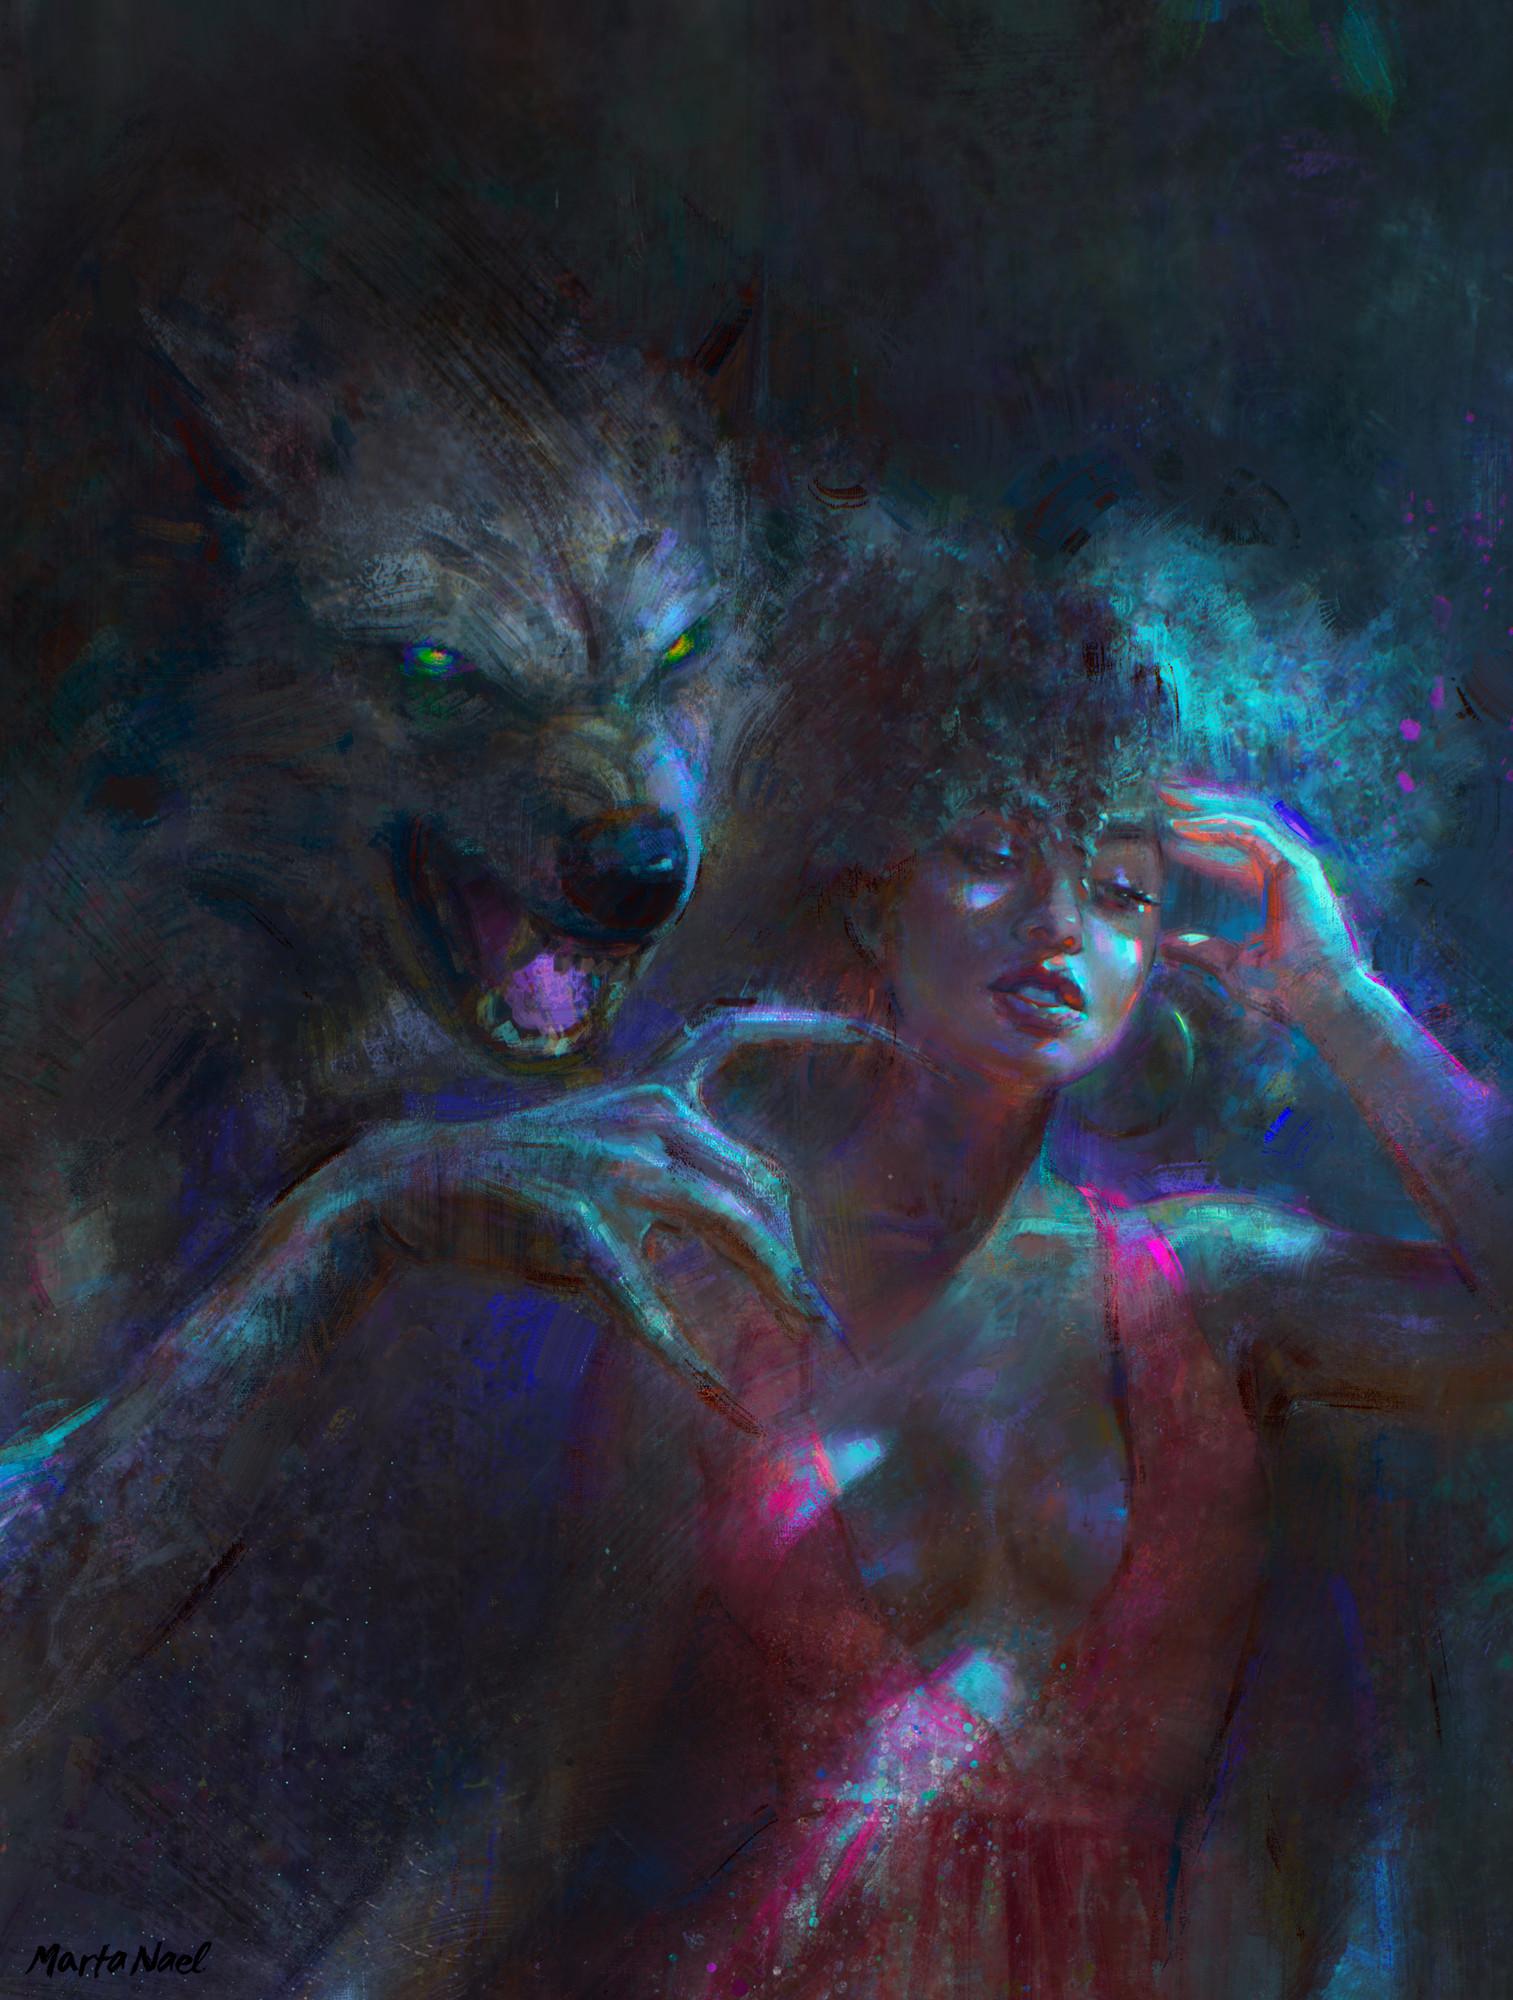 Marta nael night creatures color 2